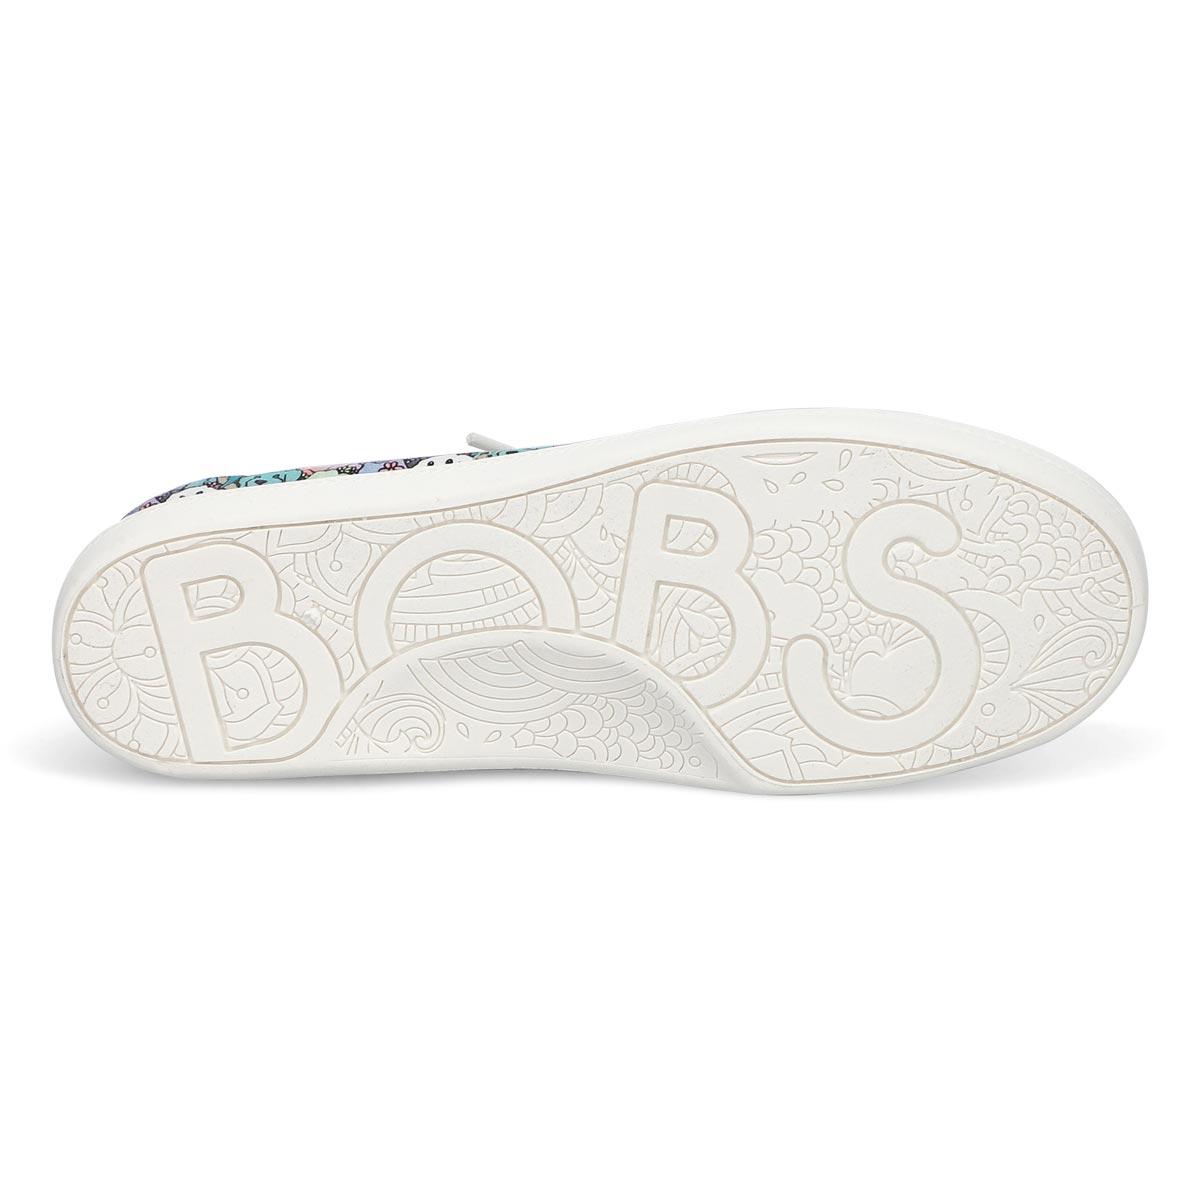 Women's Bobs Beach Bingo Aloha Sneaker - Multi